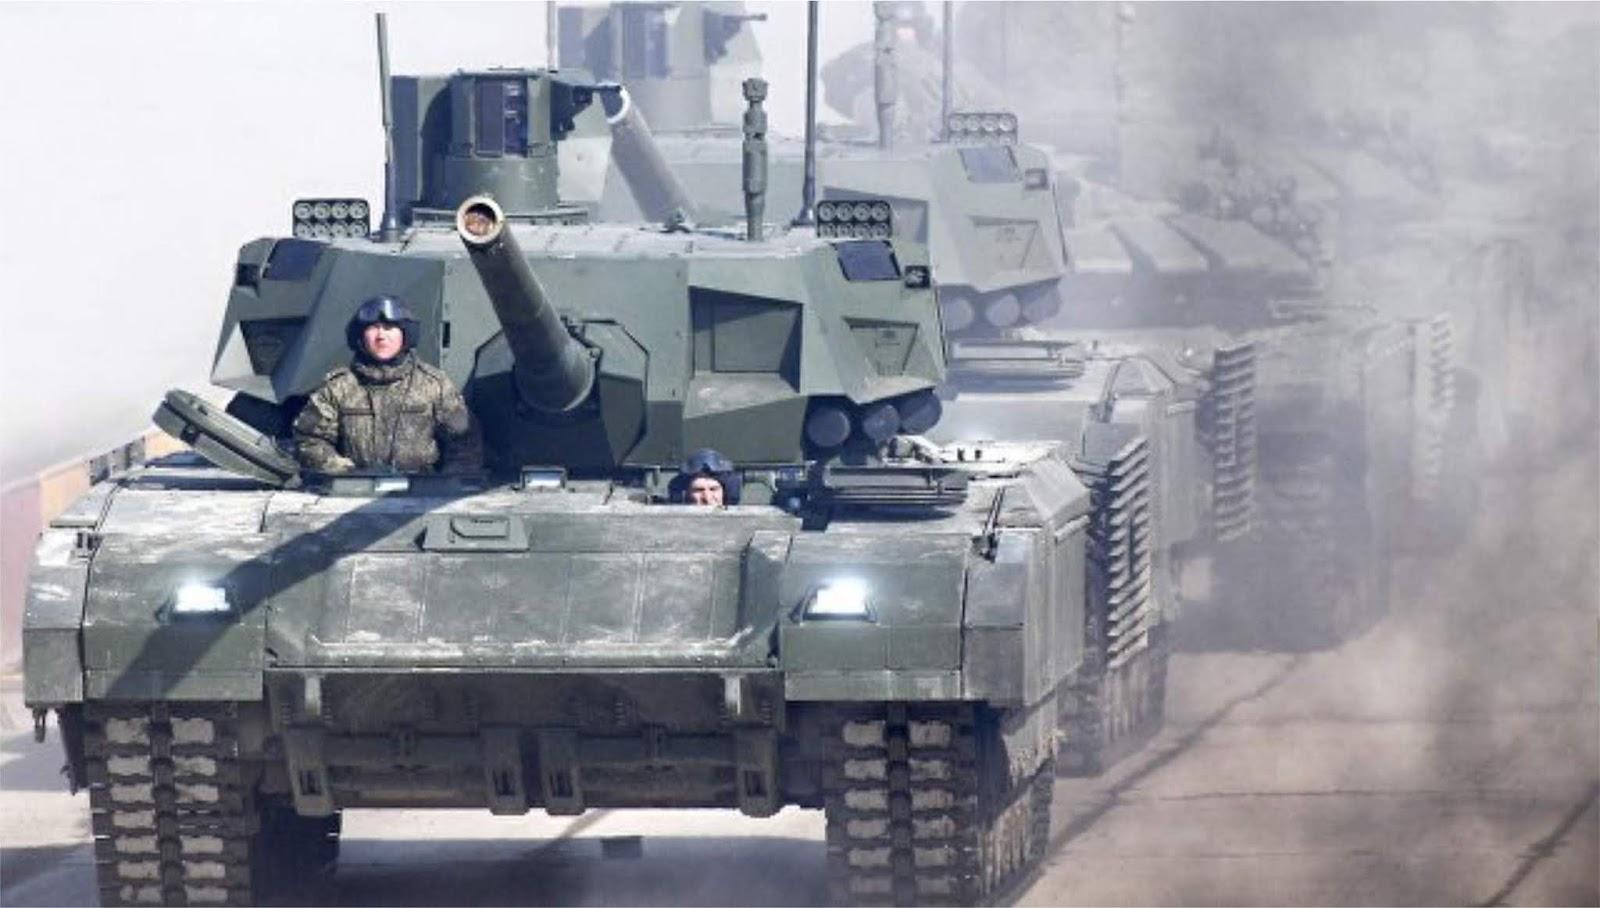 NI membandingkan Armata dengan Merkava Israel